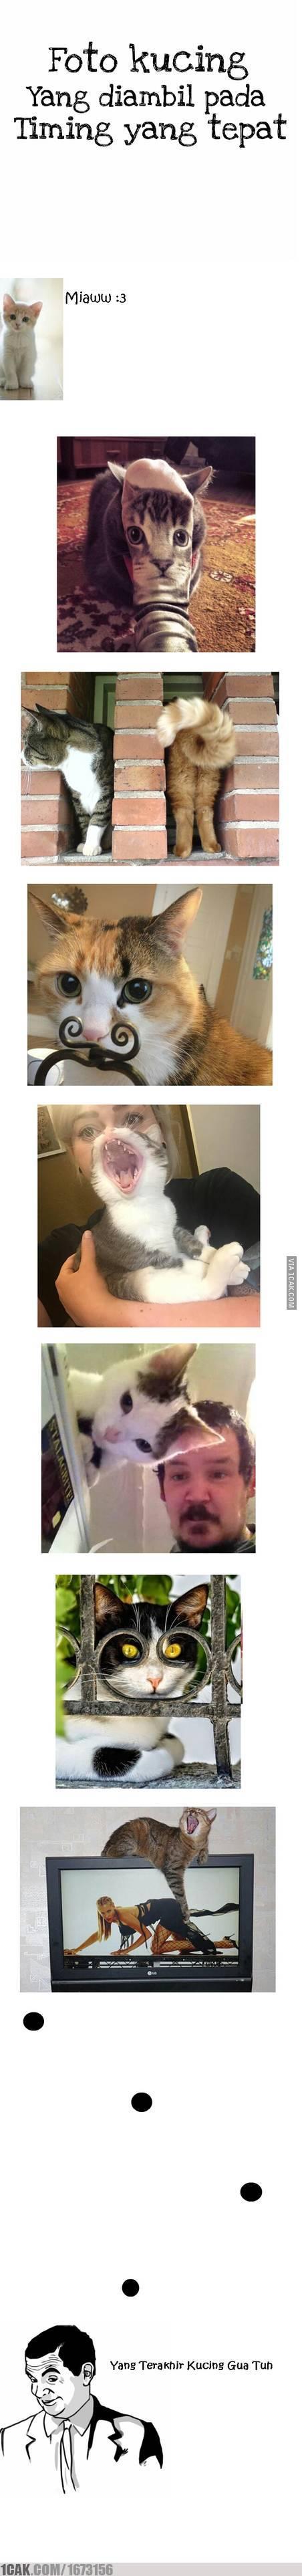 Foto Kucing Yg Diambil Pada Waktu Yang Tepat Other Pinterest